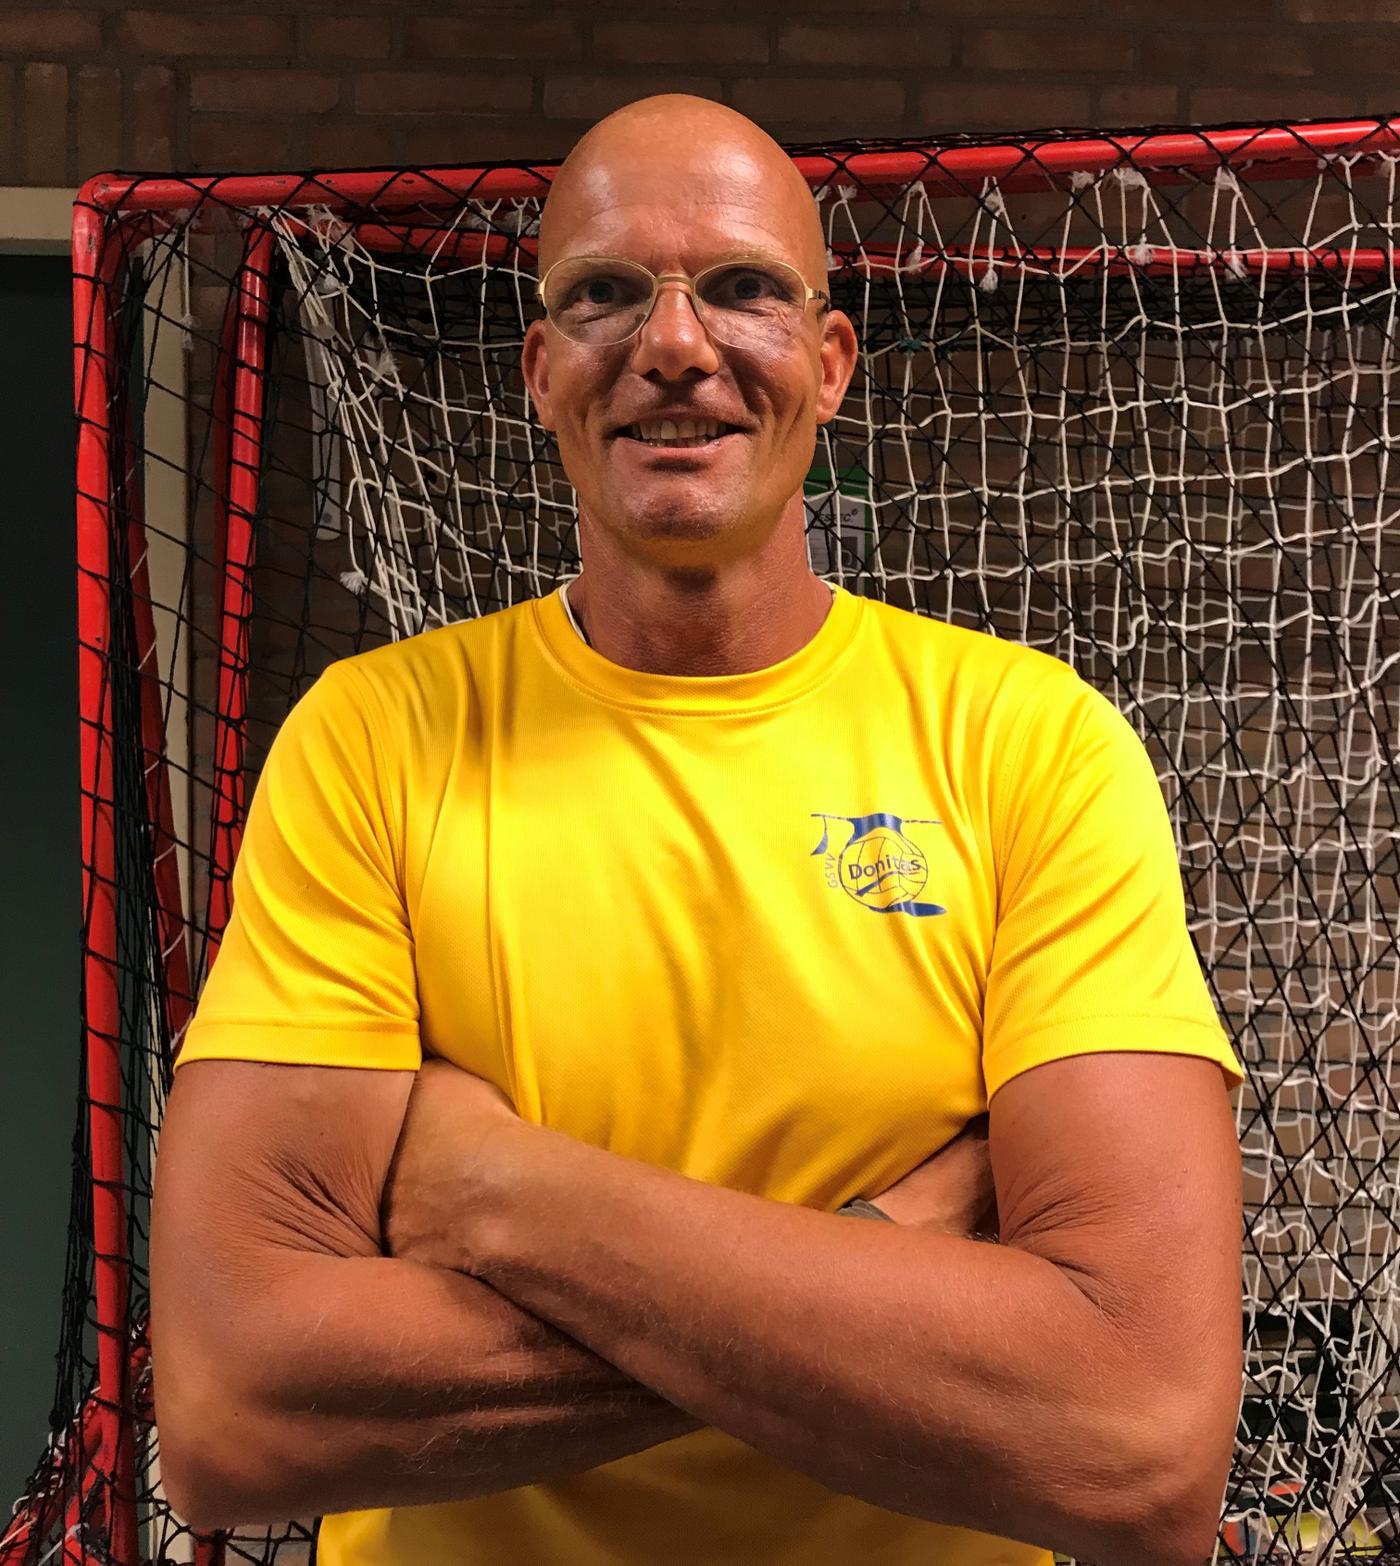 OBEG Donitas dames 1 nieuwe trainer/coach!